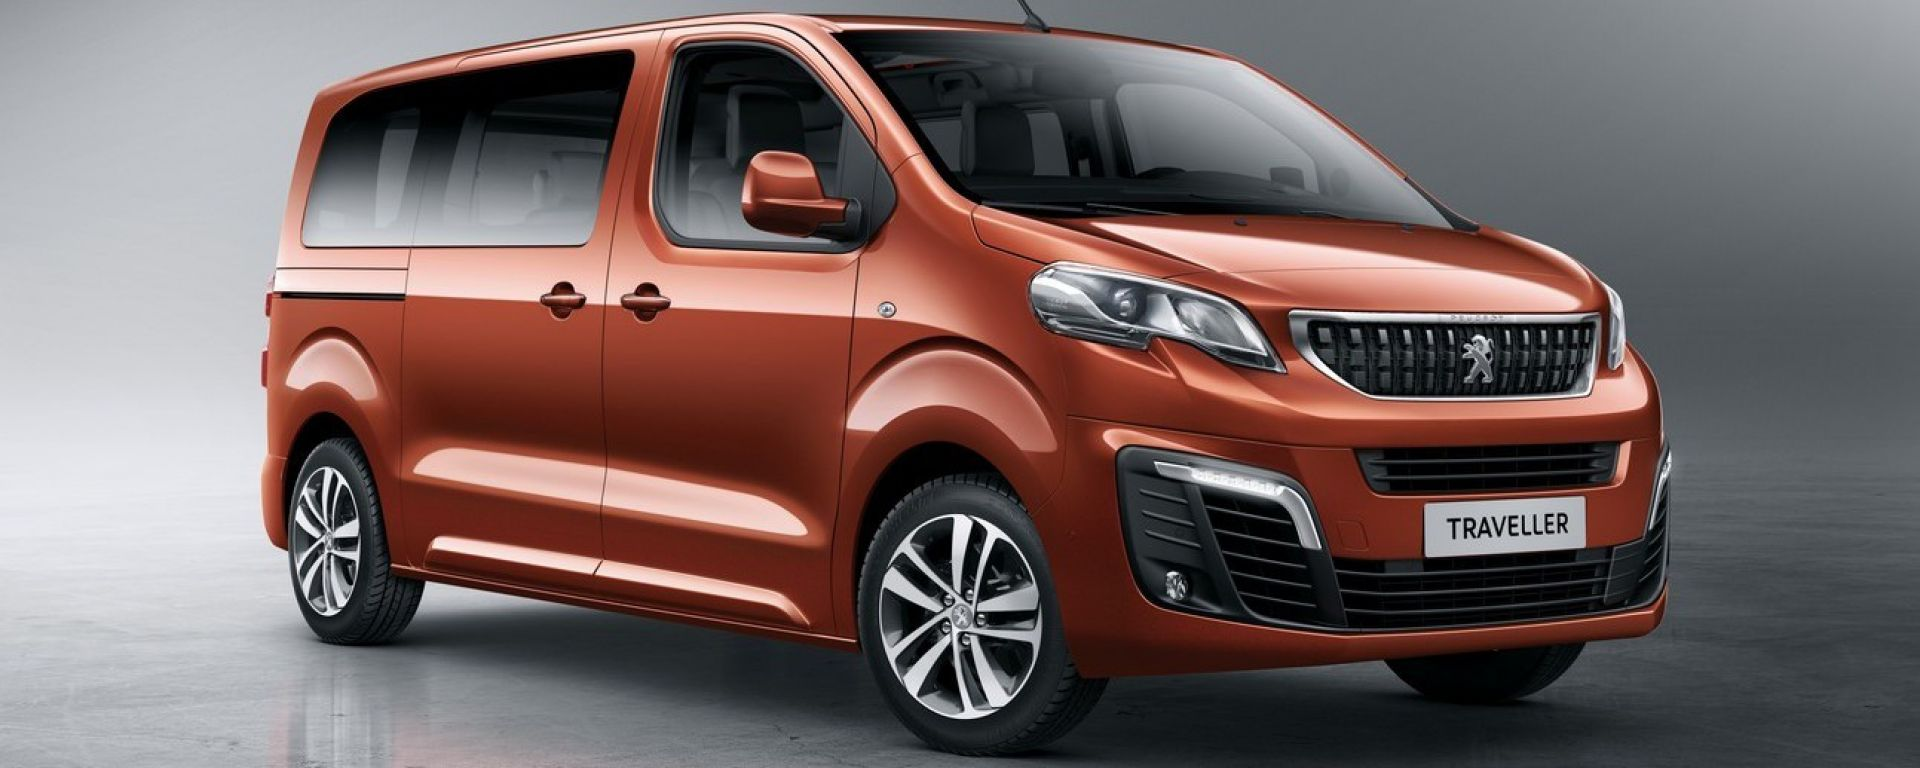 Peugeot Traveller, Citroen Spacetourer e Toyota Proace